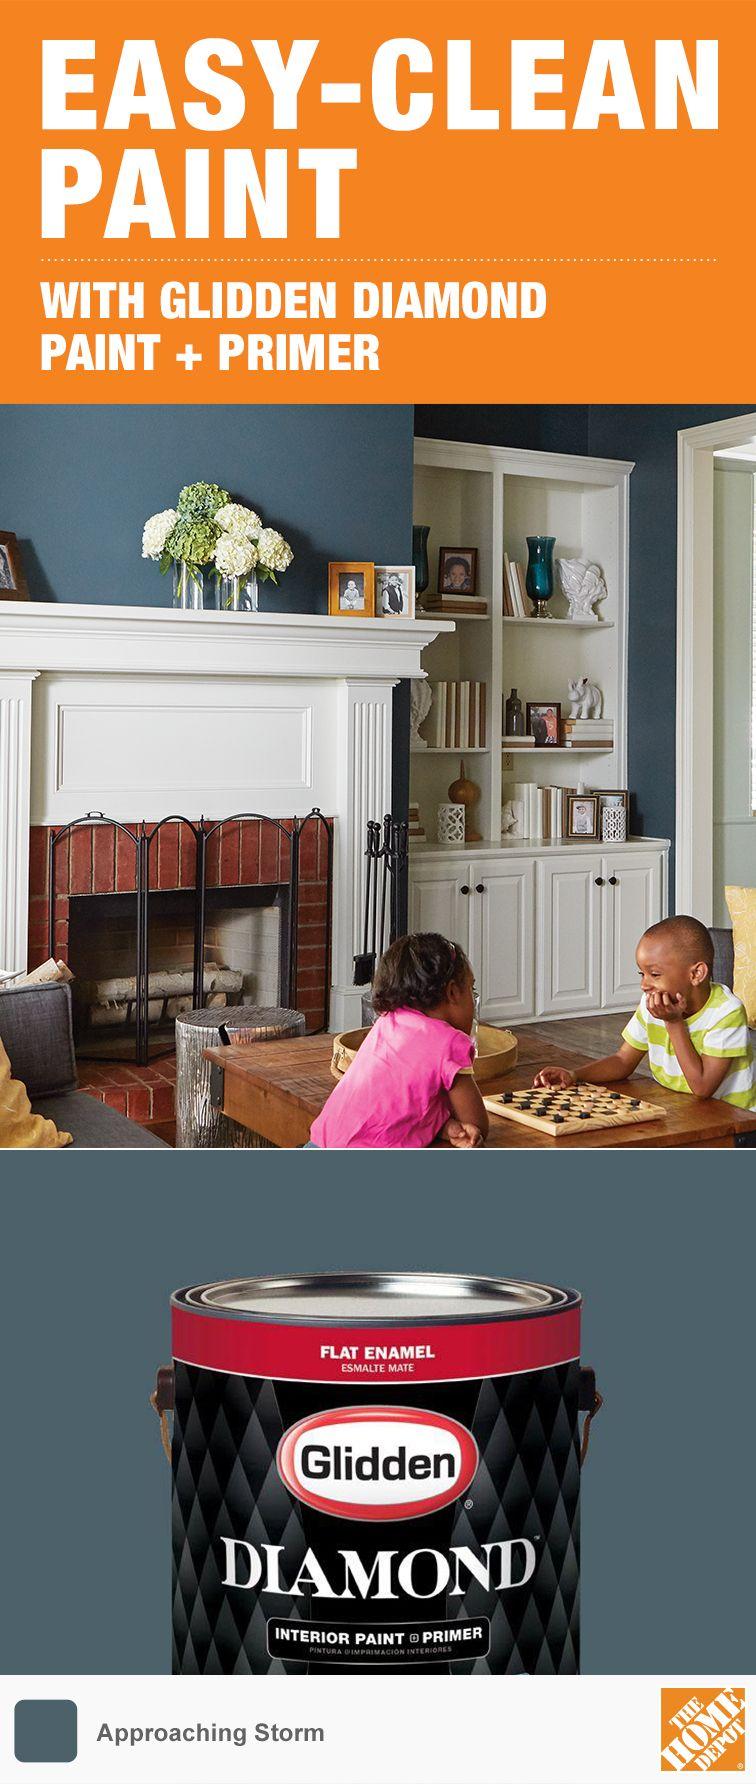 Glidden Paint Colors And Primers Glidden Paint Colors Home Repairs Glidden Paint